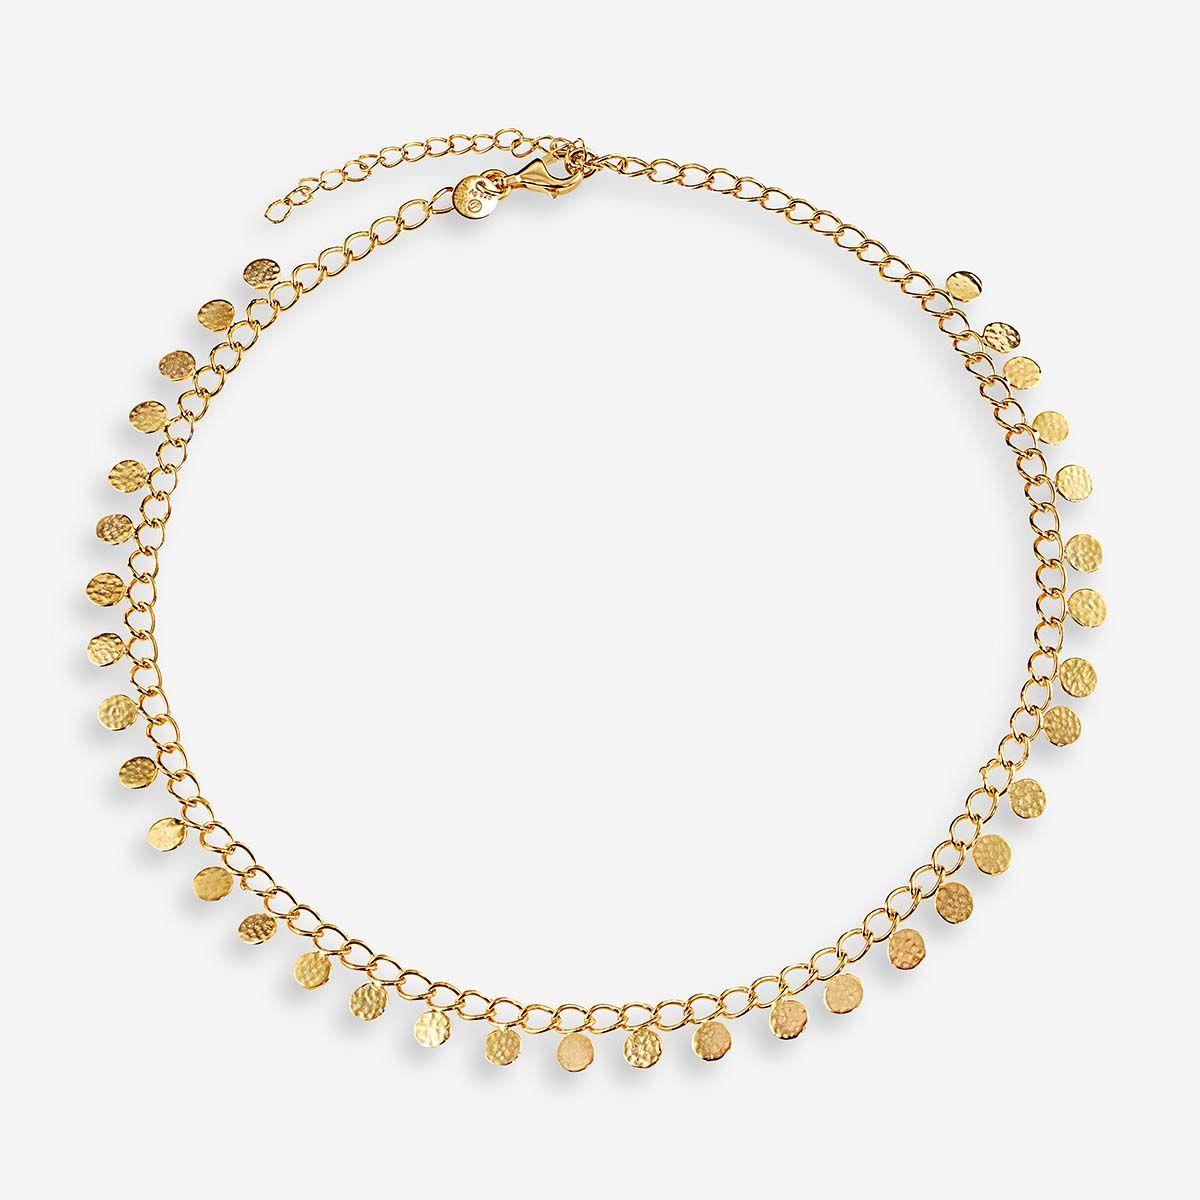 Coin necklace - Halsketten - 18k vergoldet